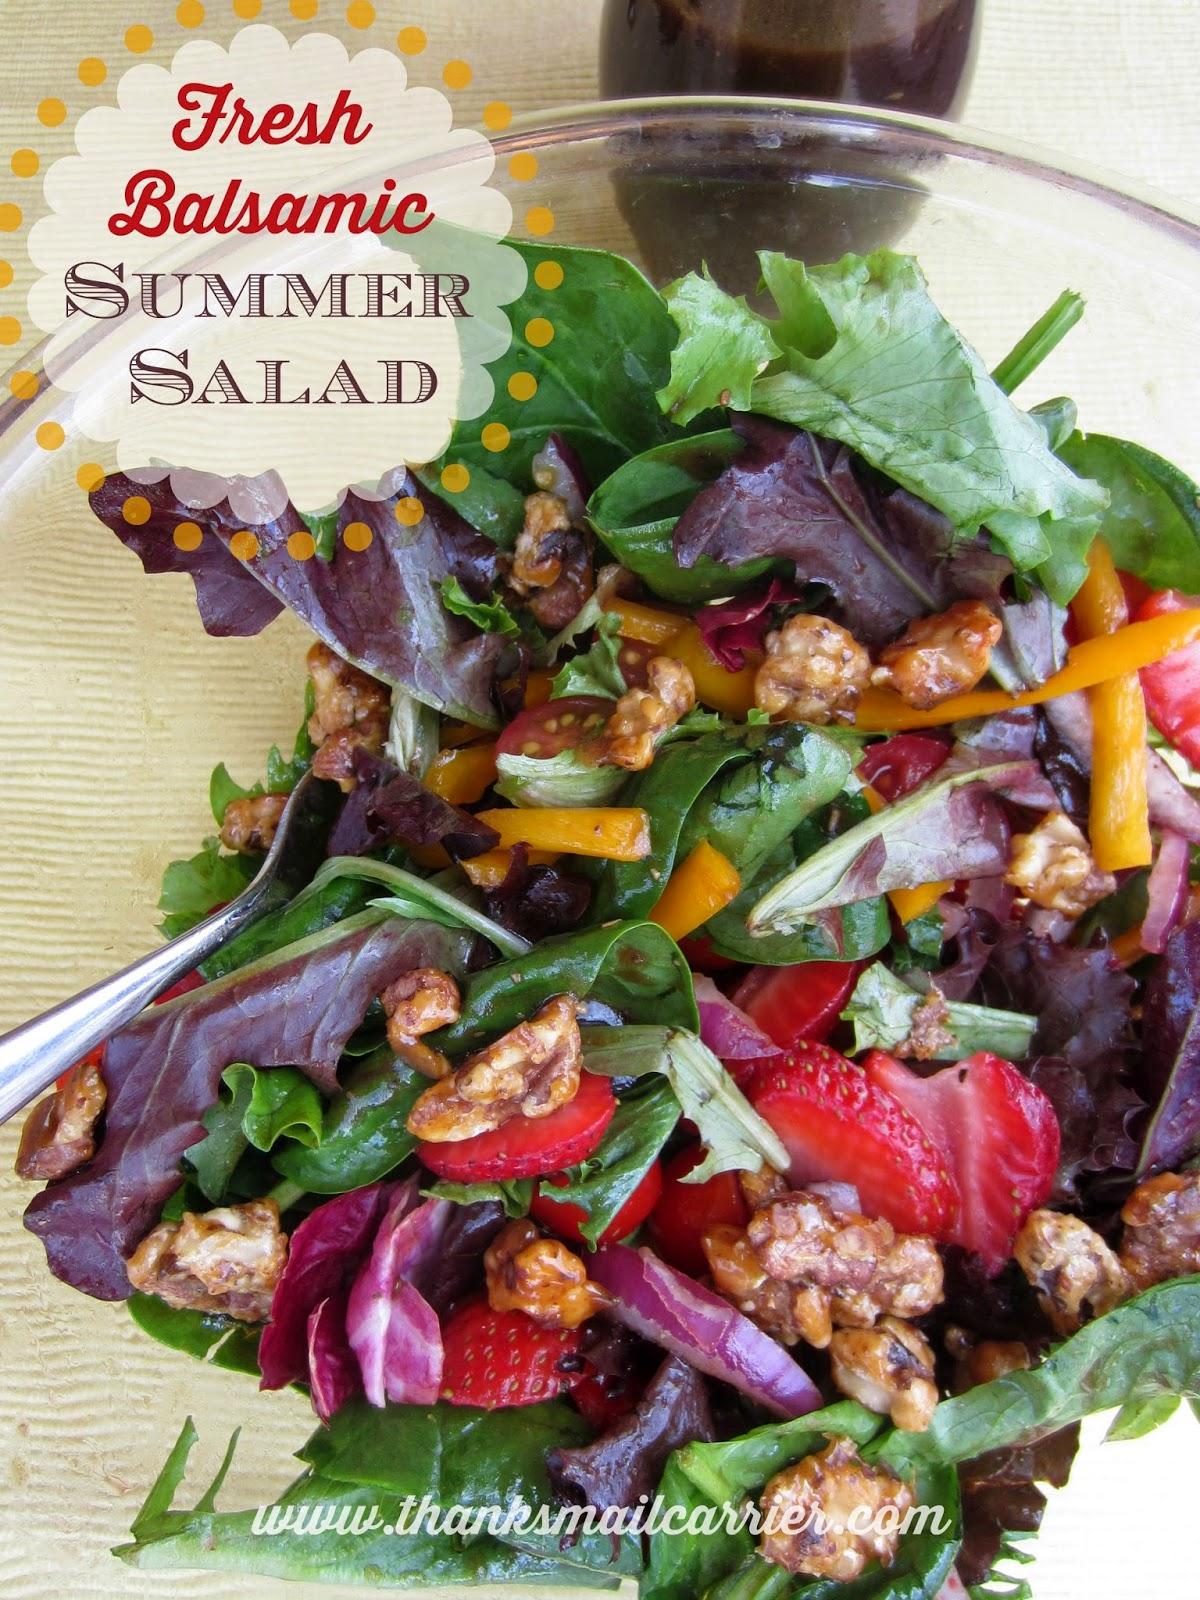 Balsamic Summer Salad